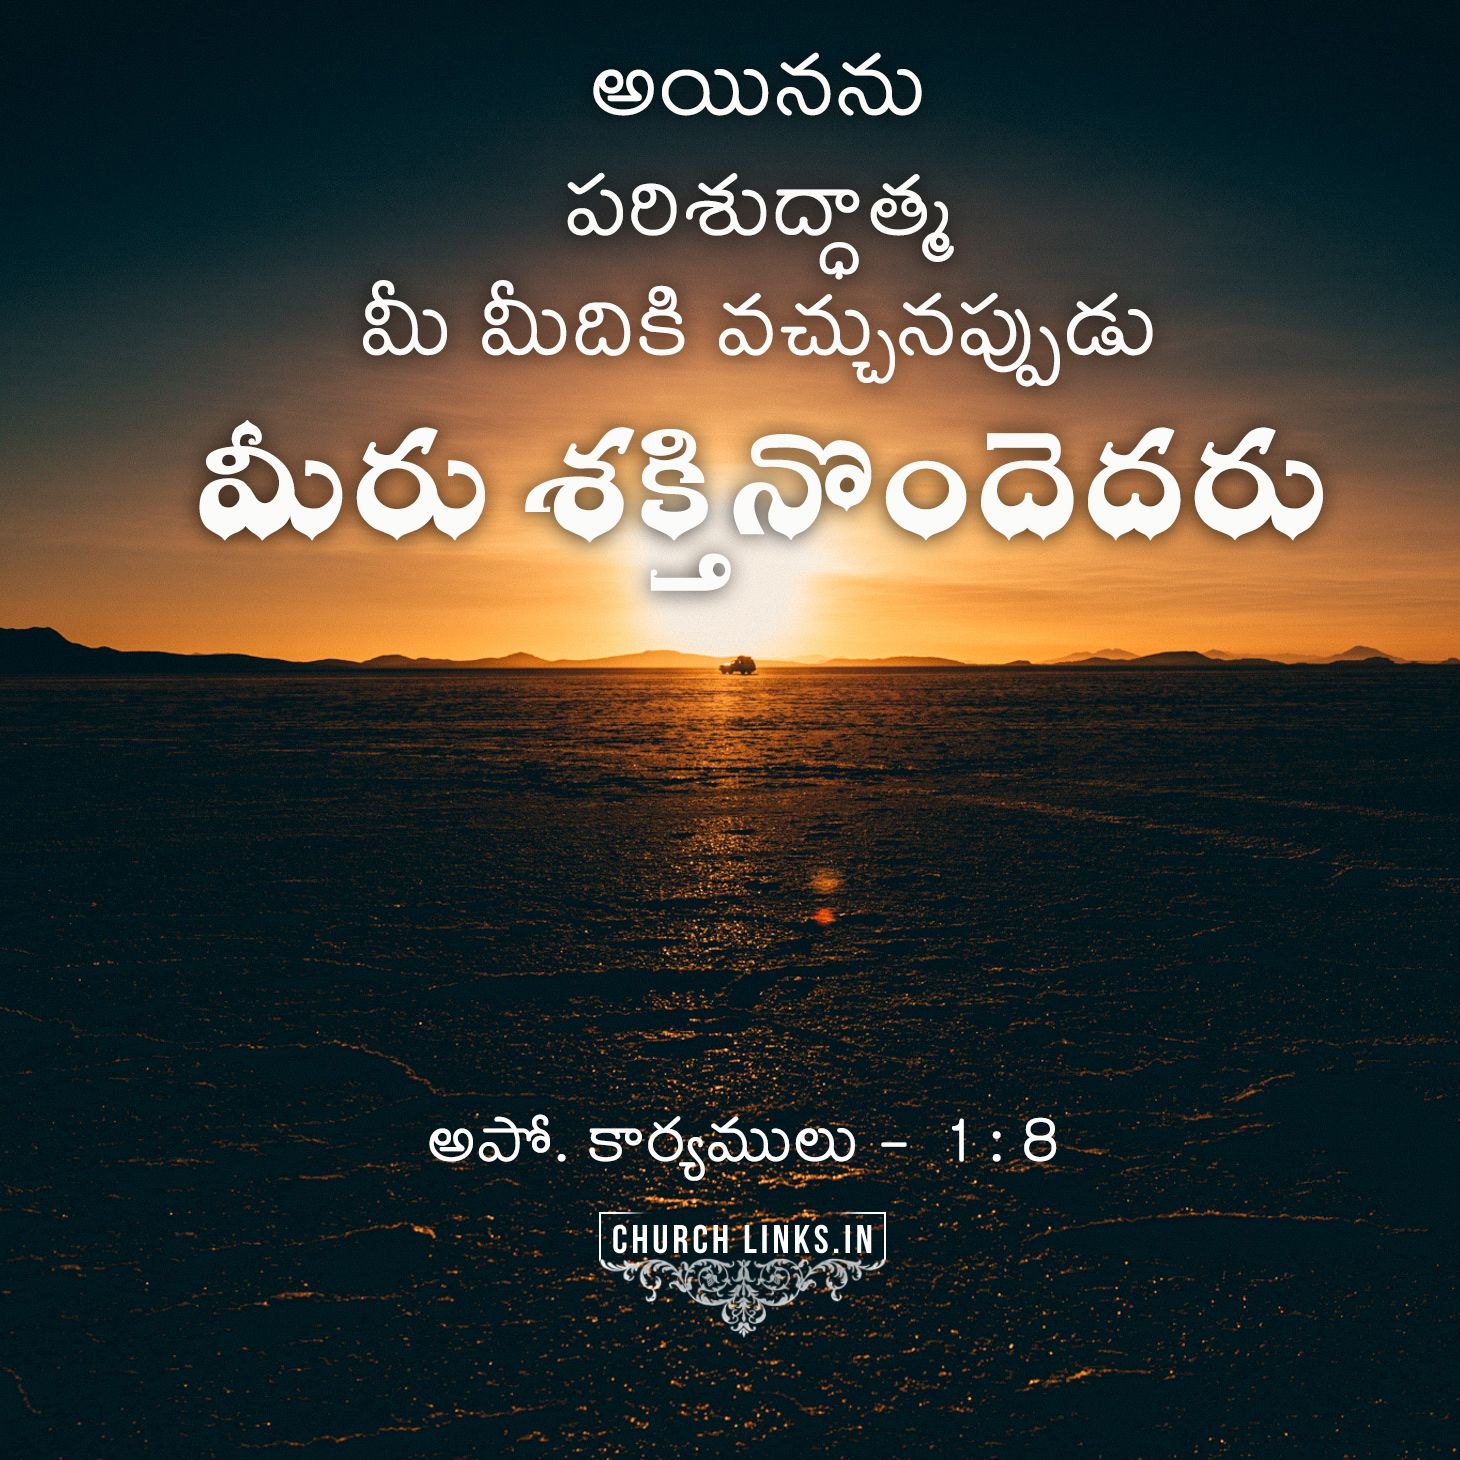 Pin on #Telugu_Bible_Verses